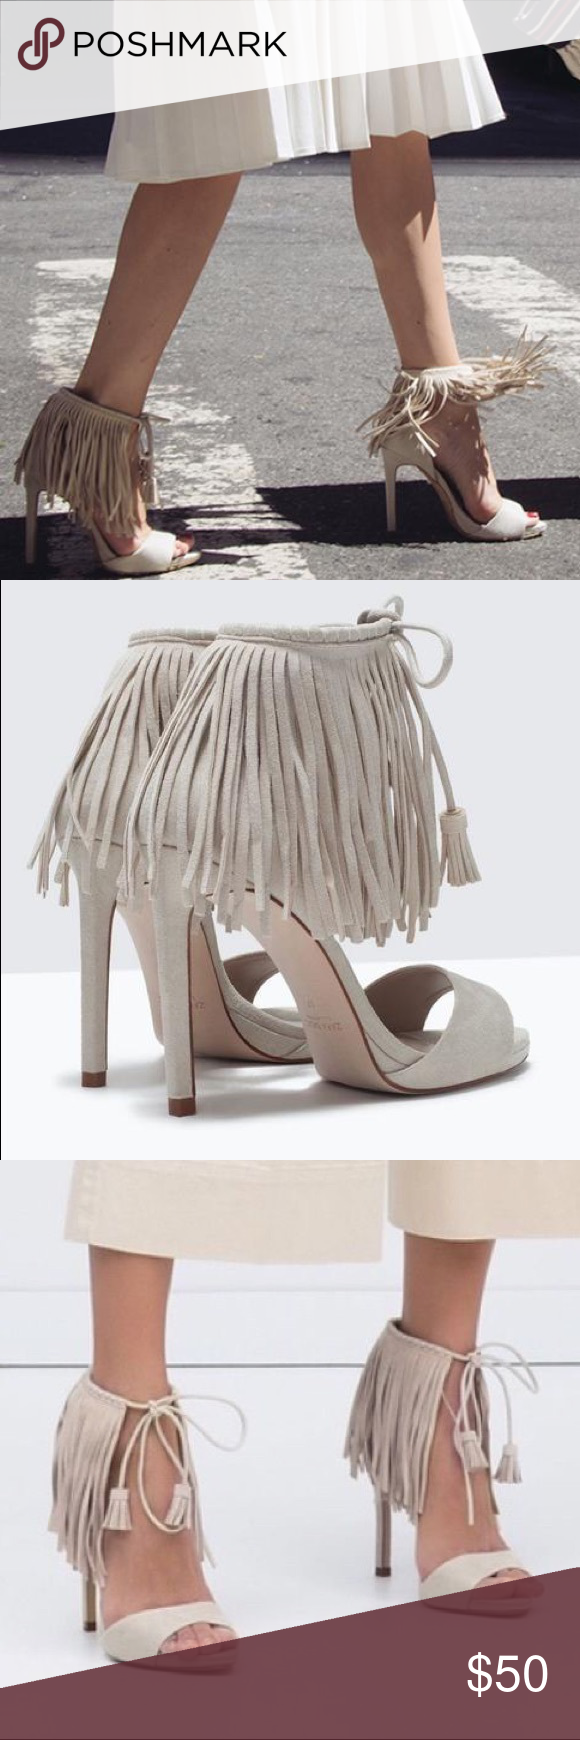 85e556c7cbb Zara Cream Fringe Tassel Heels Sandals Conditions as seen on photos Zara  Shoes Heels